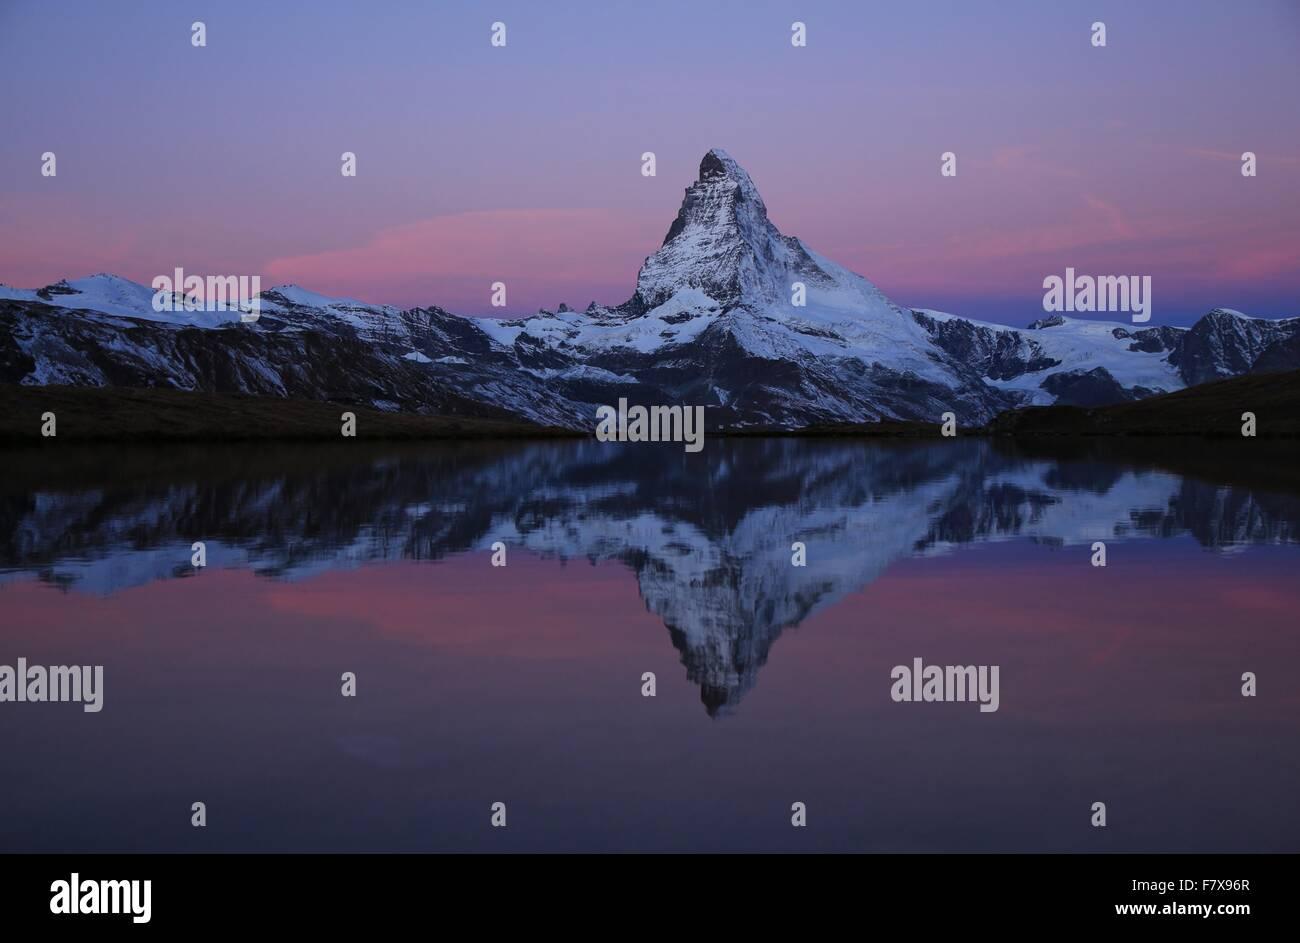 Pink morning sky over the Matterhorn - Stock Image